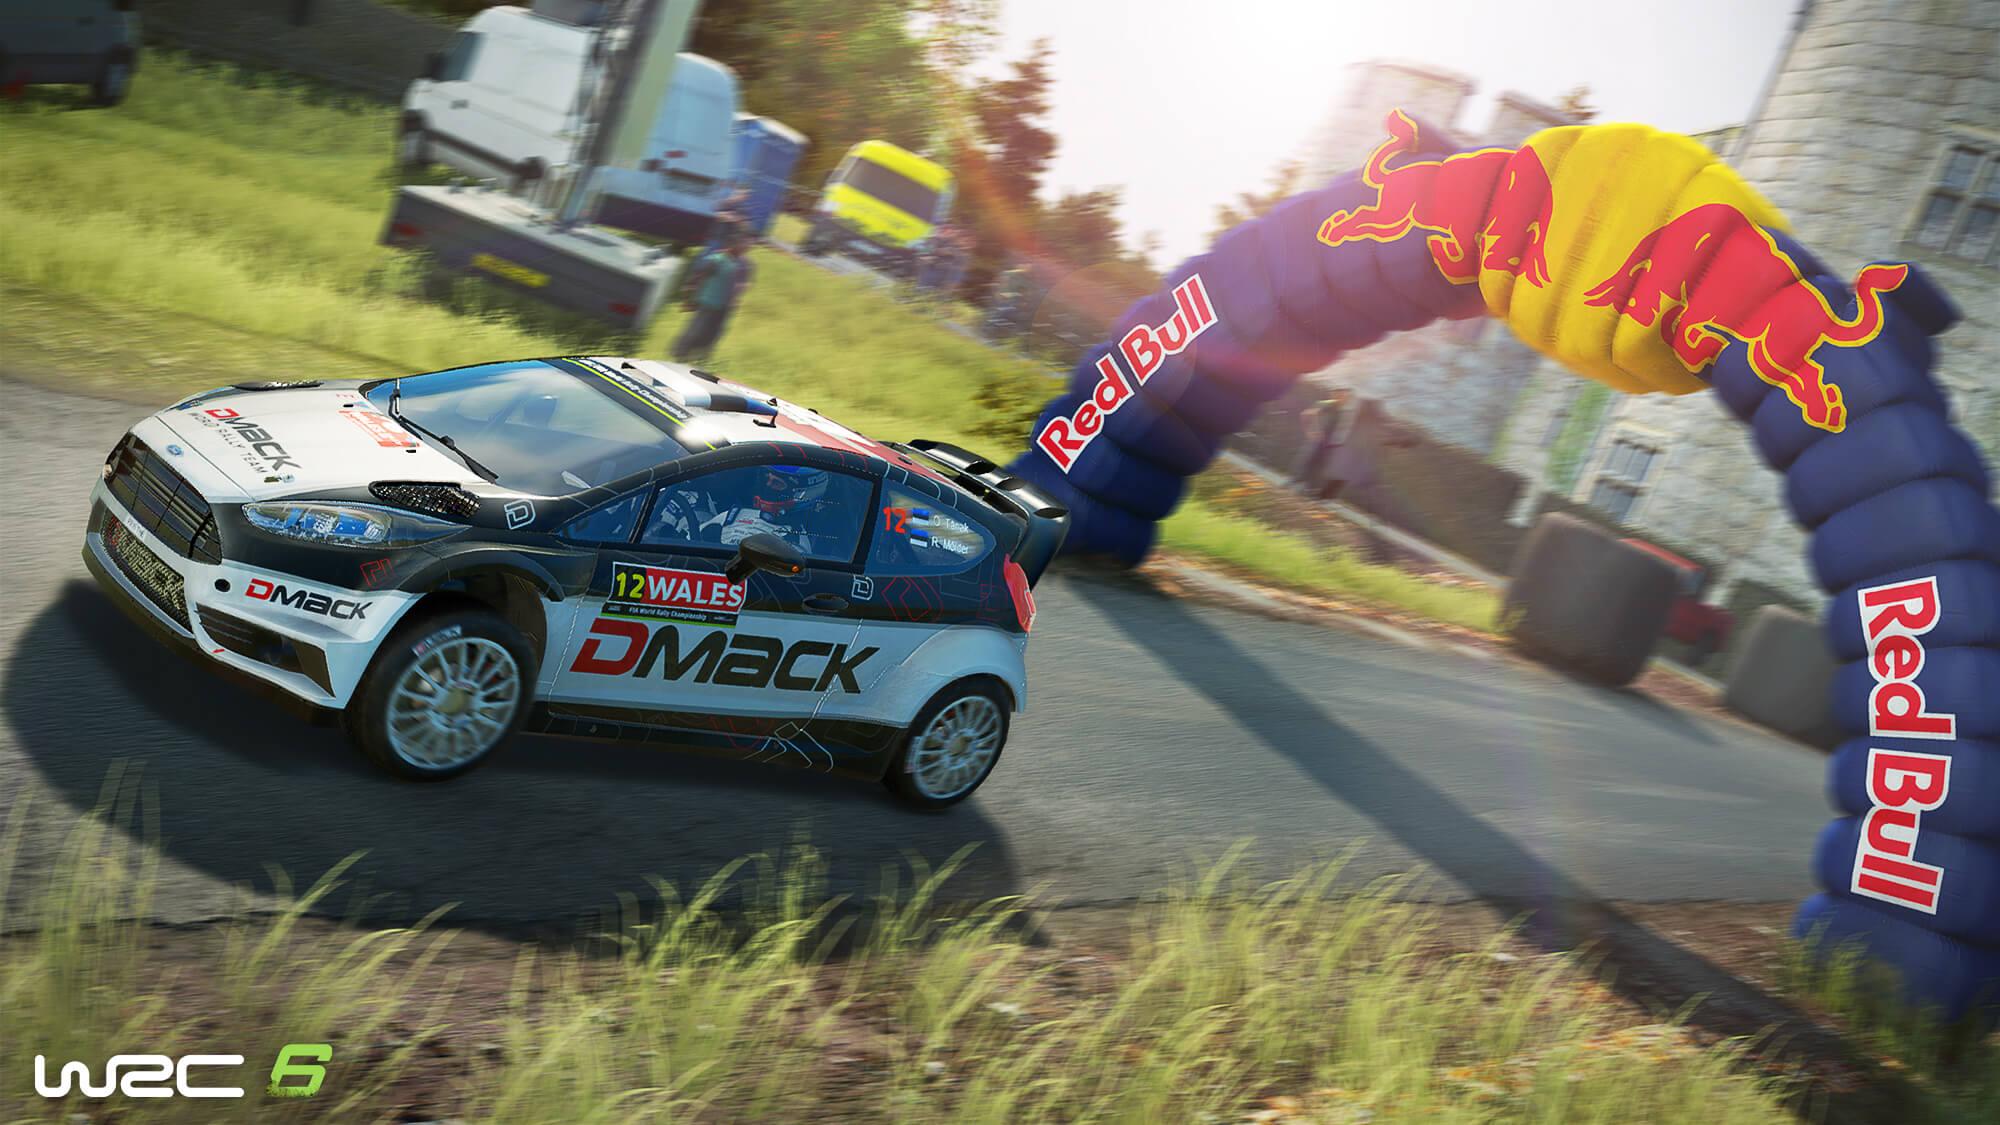 Bandai Namco Anuncia WRC6, nuevo juego multiplataforma de rally